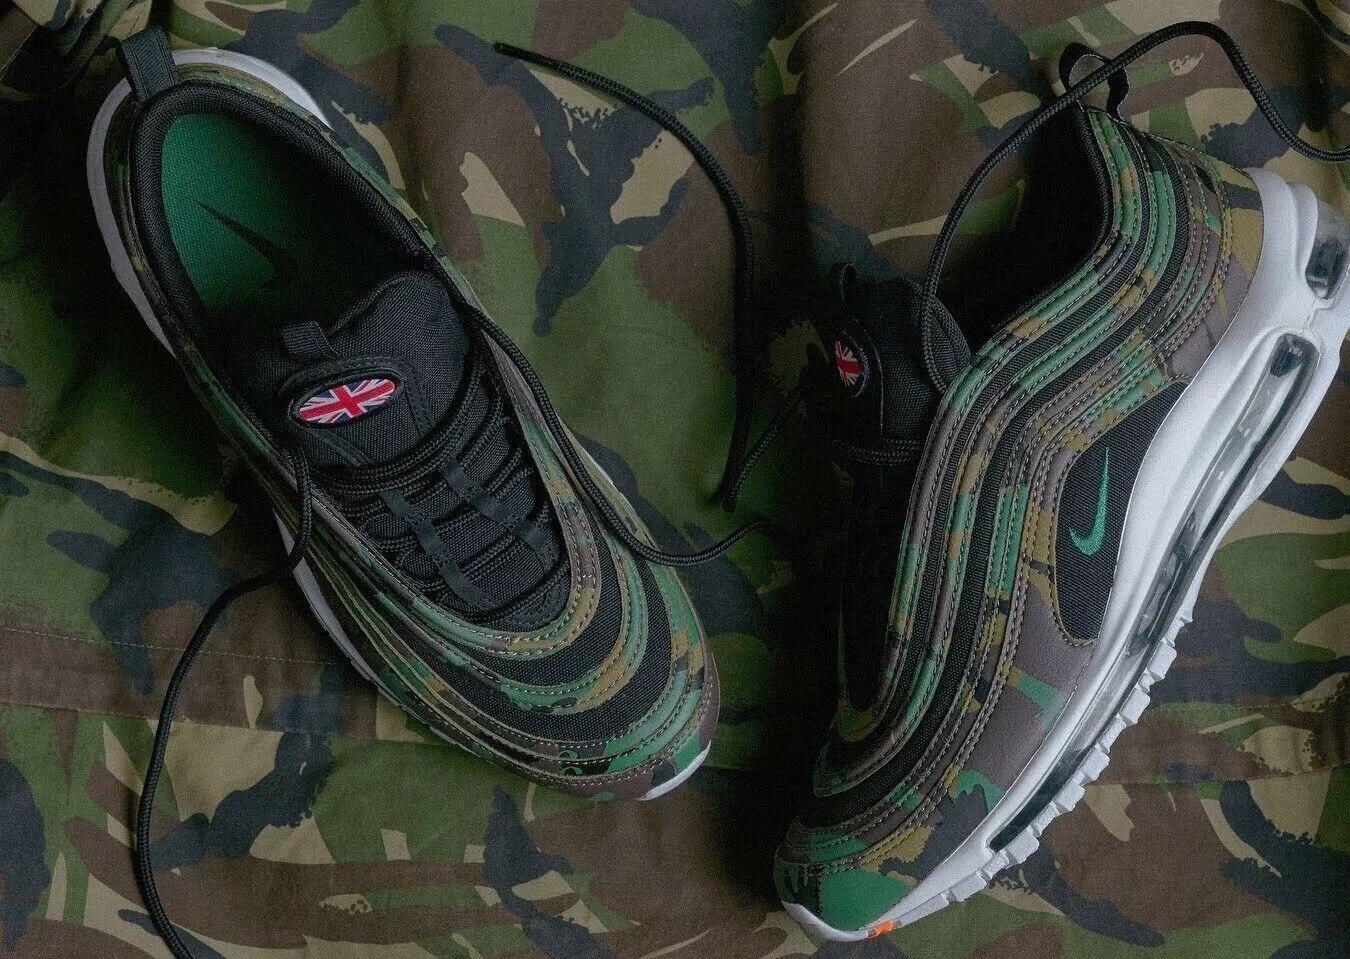 Nike Air Max 97 Country Camo 'UK' Premium QS AJ2614-201 UK 6 EU 40 25cm New